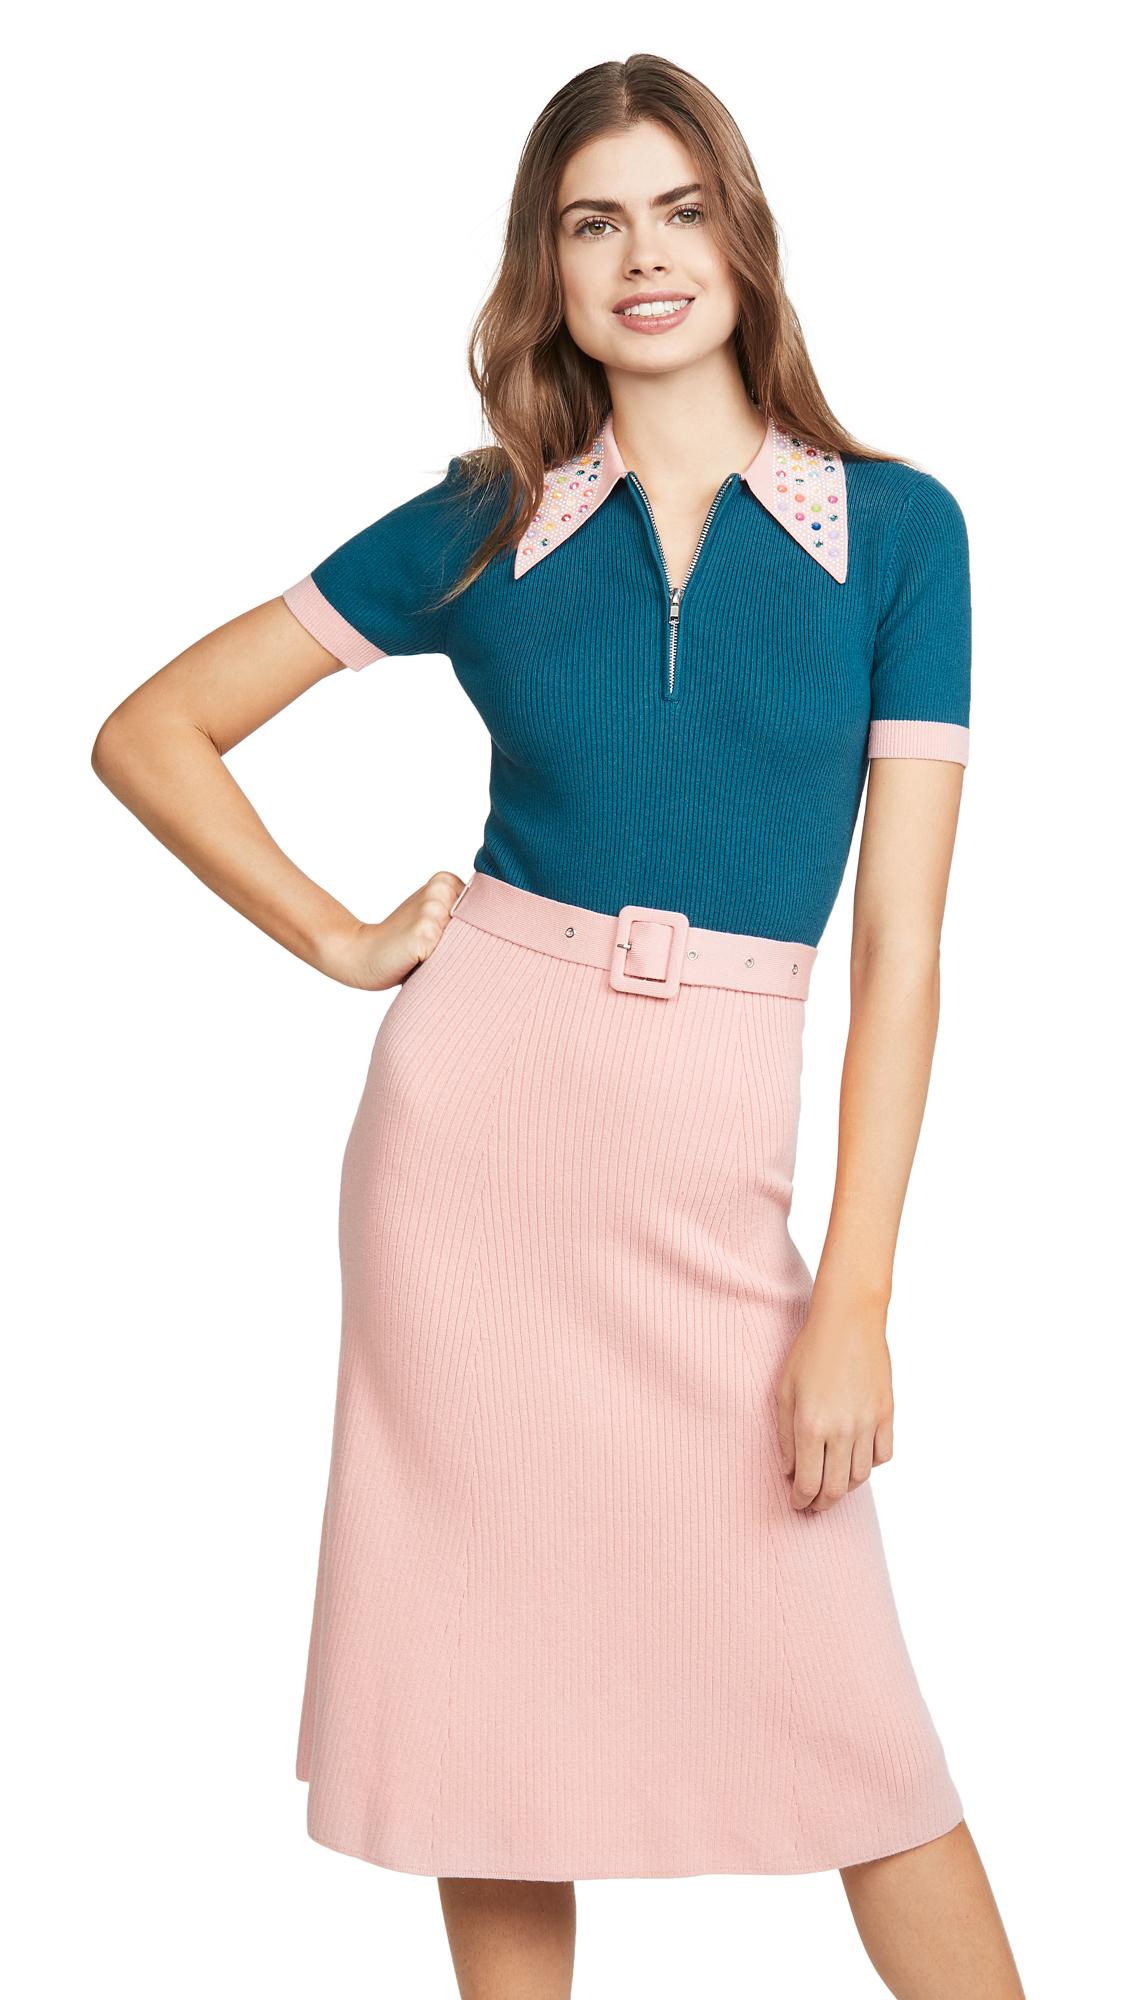 Buy JoosTricot Peachskin Dress online beautiful JoosTricot Clothing, Dresses